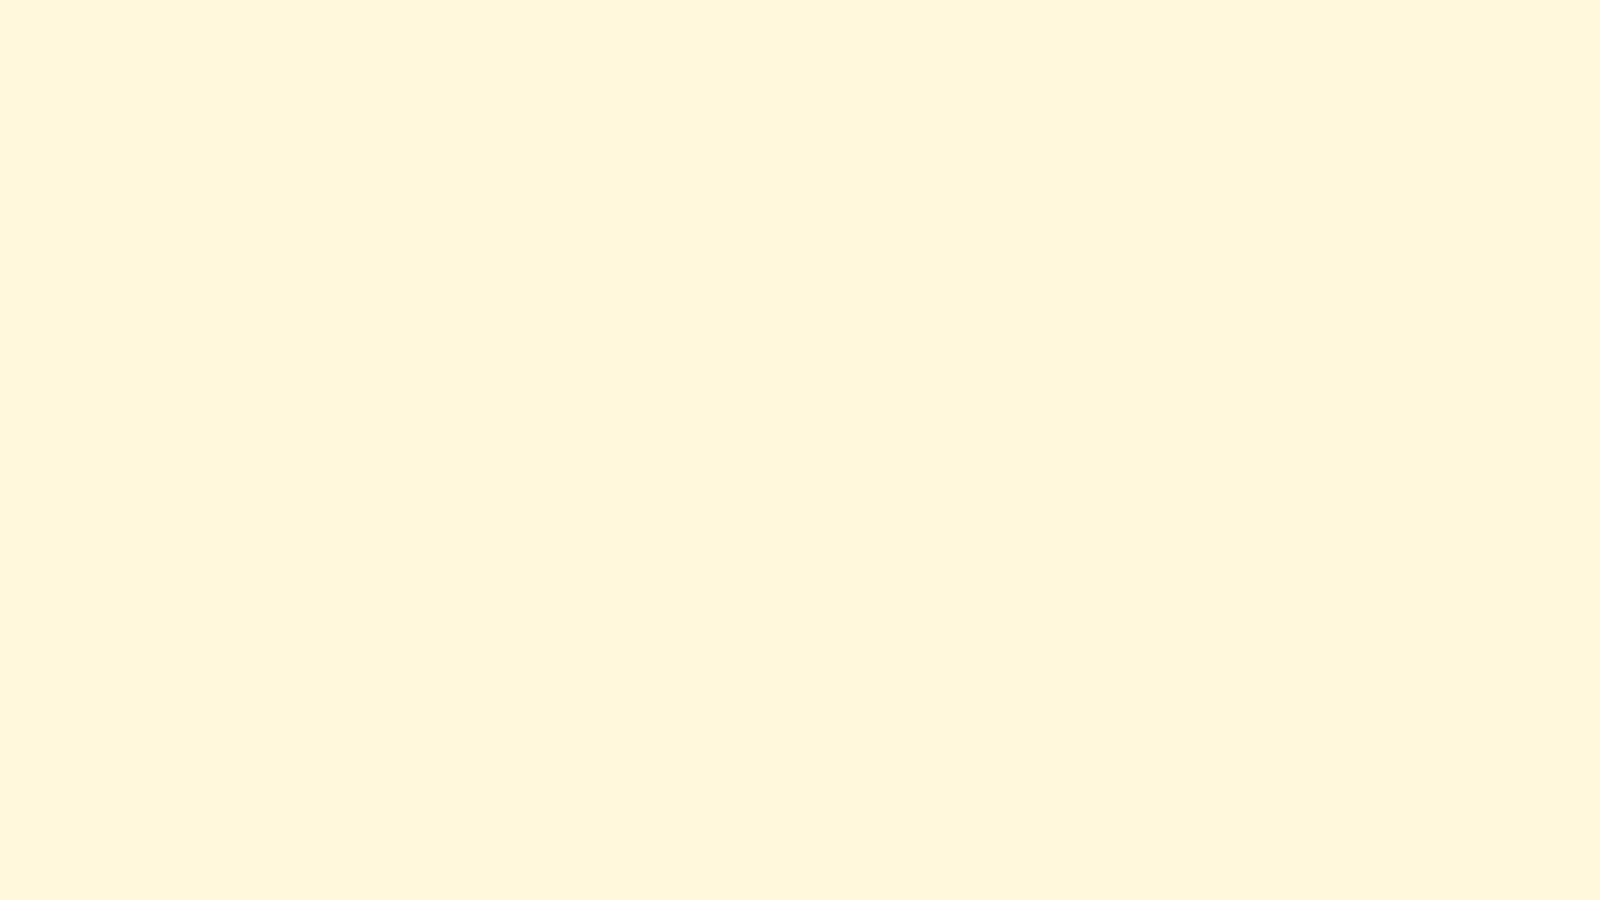 1600x900 Cornsilk Solid Color Background